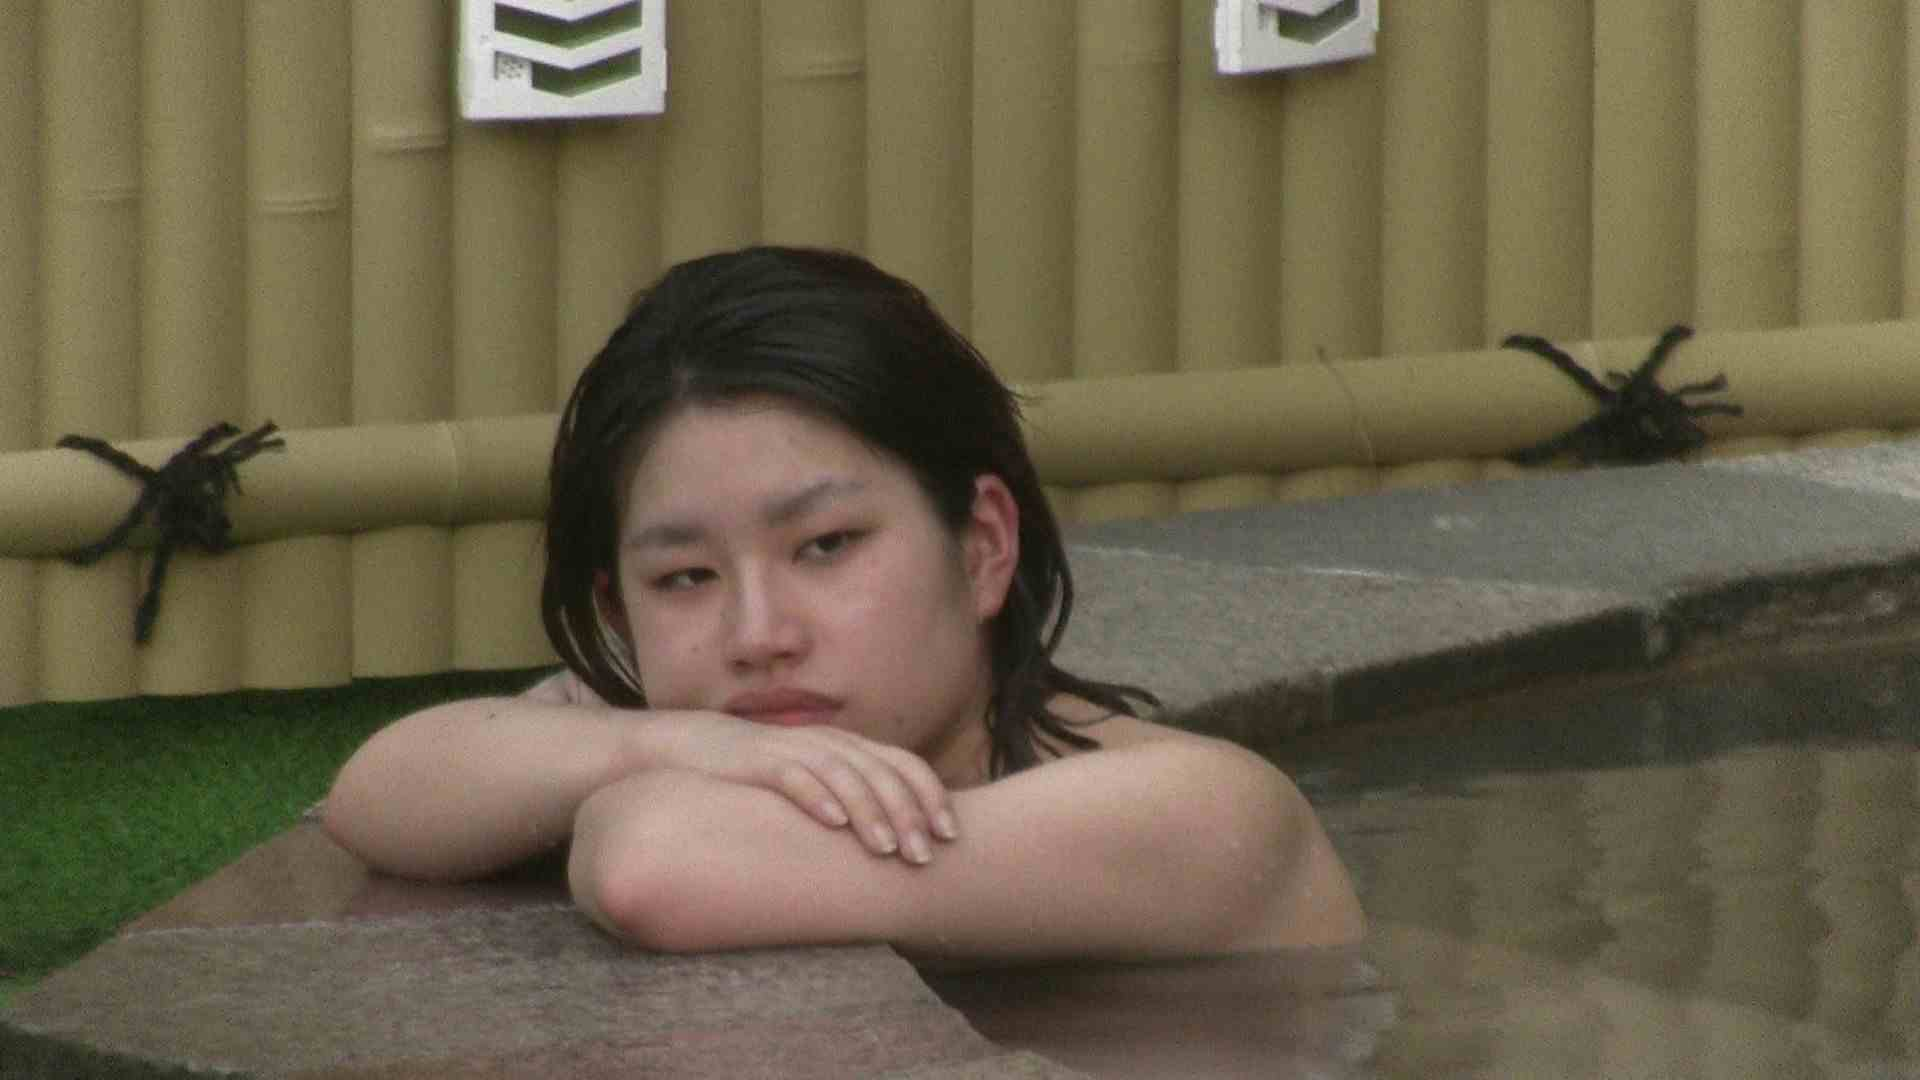 Aquaな露天風呂Vol.230 HなOL | 盗撮  83pic 26